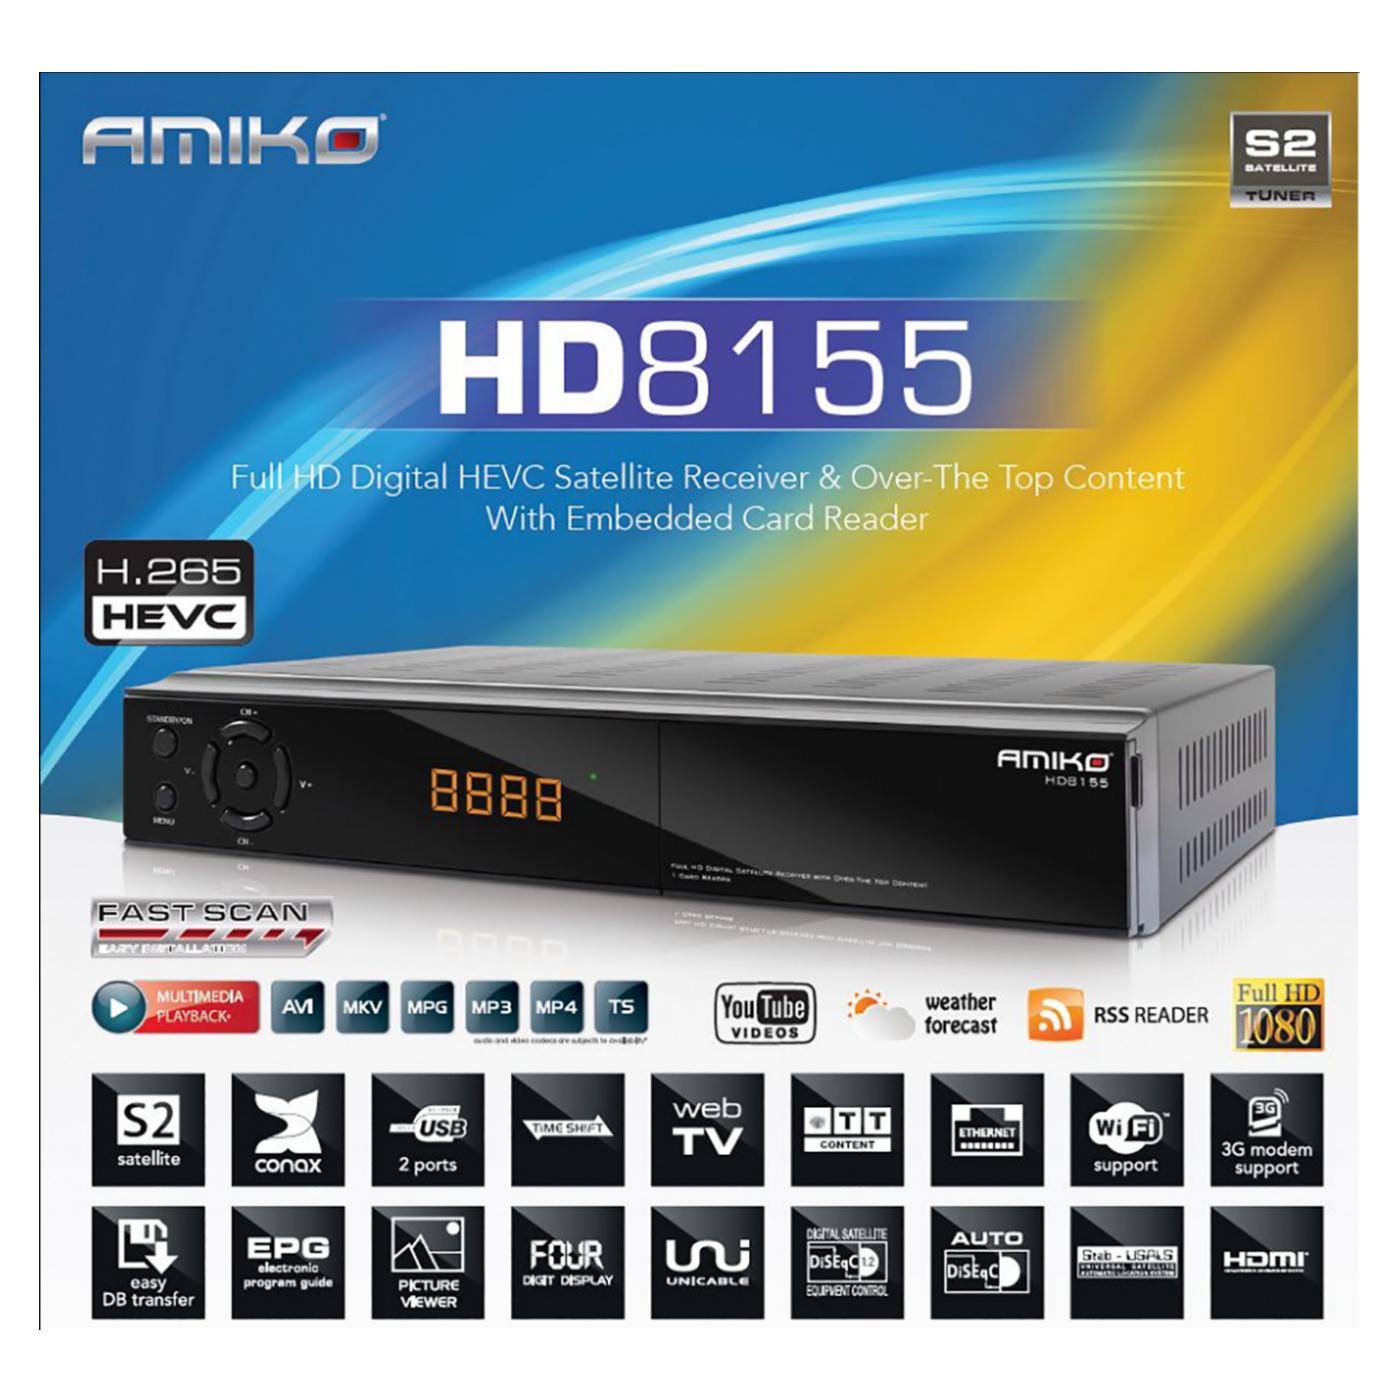 HD8155